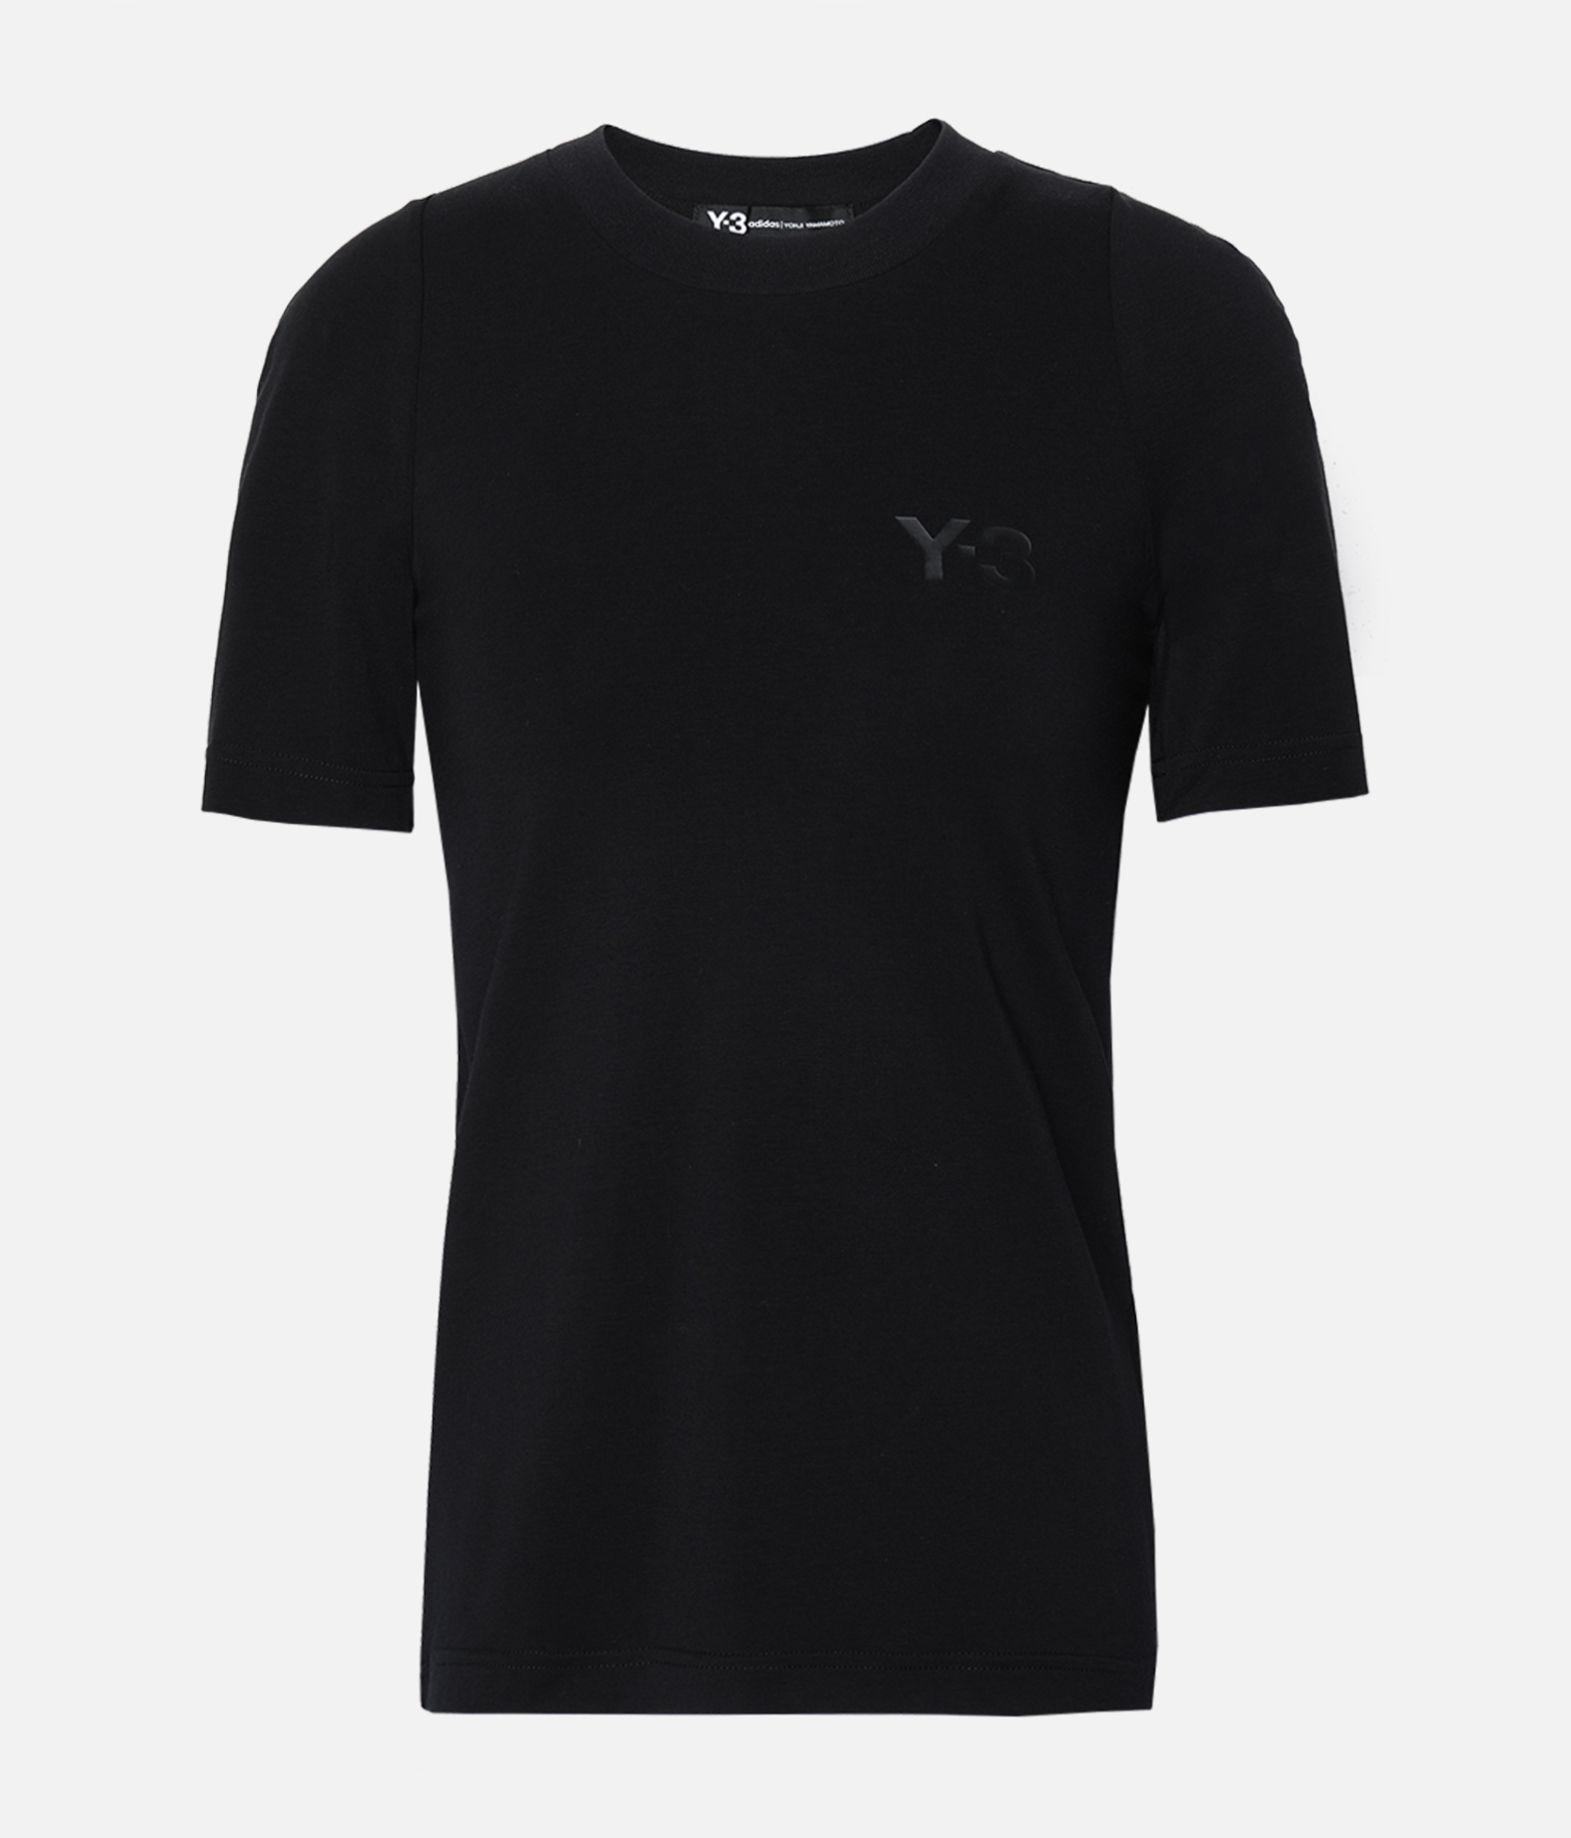 Y-3 Y-3 YOHJI TEE Kurzärmliges T-shirt Damen f